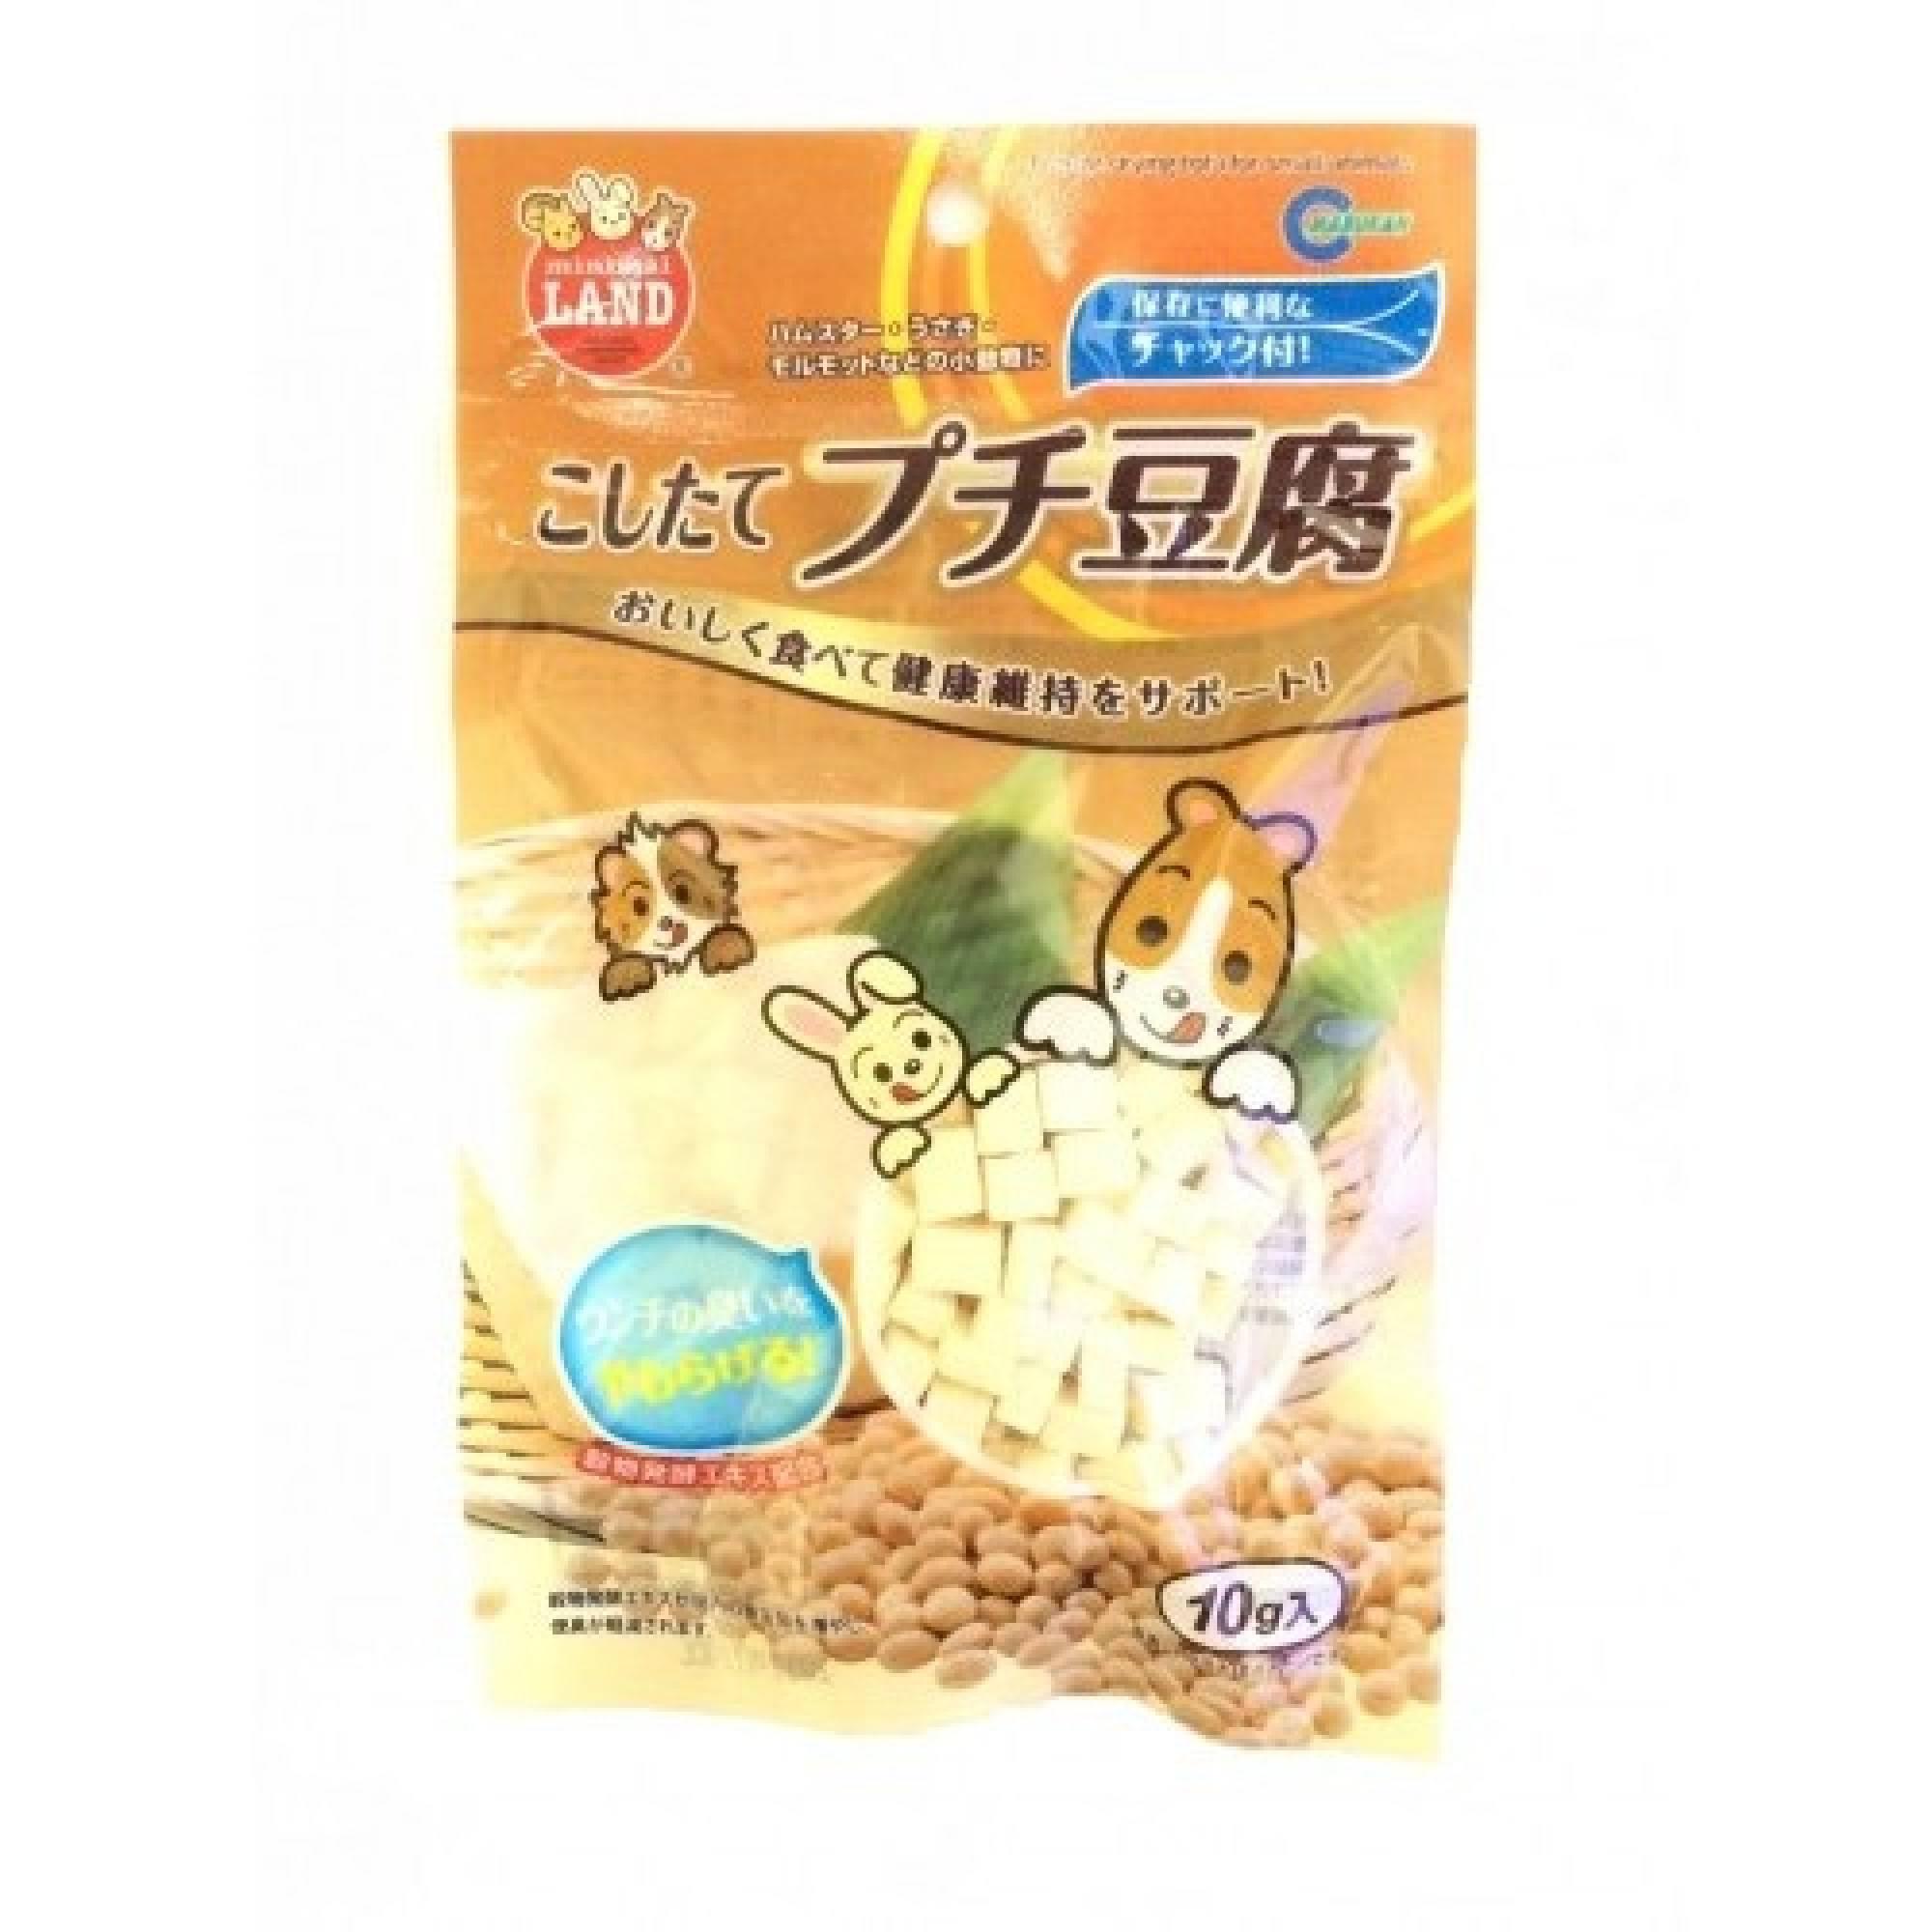 Marukan MR826 - Freeze Dried Tofu For Small Animals 10g